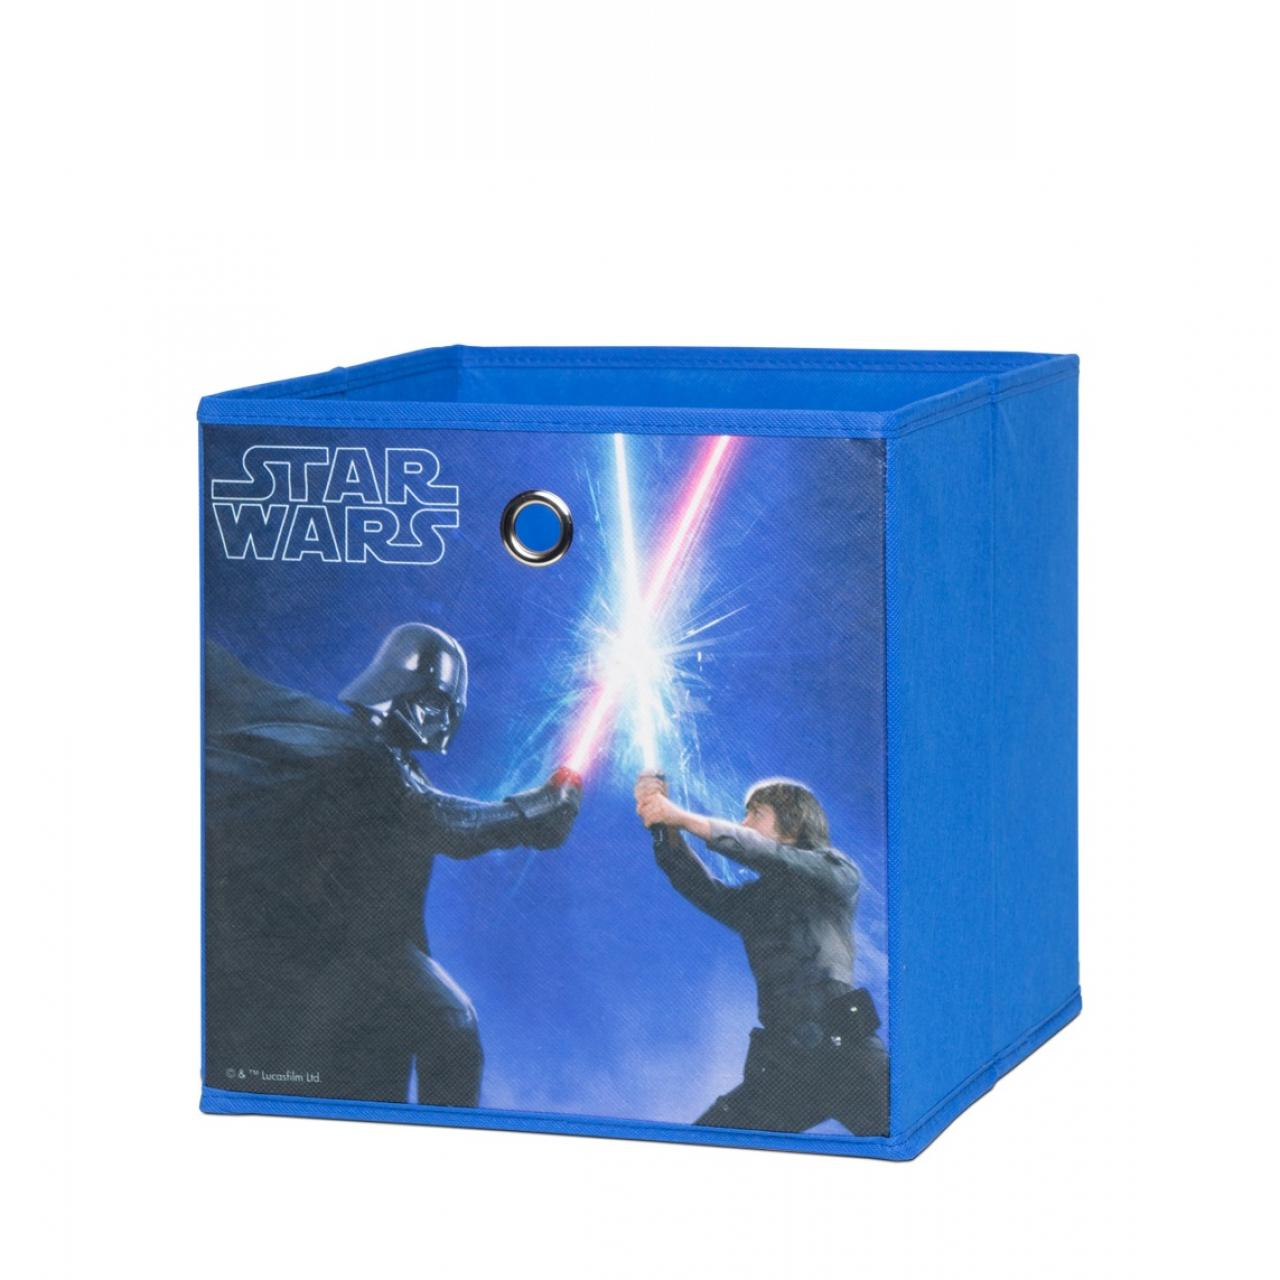 Faltbox Star Wars - Motiv G - blau